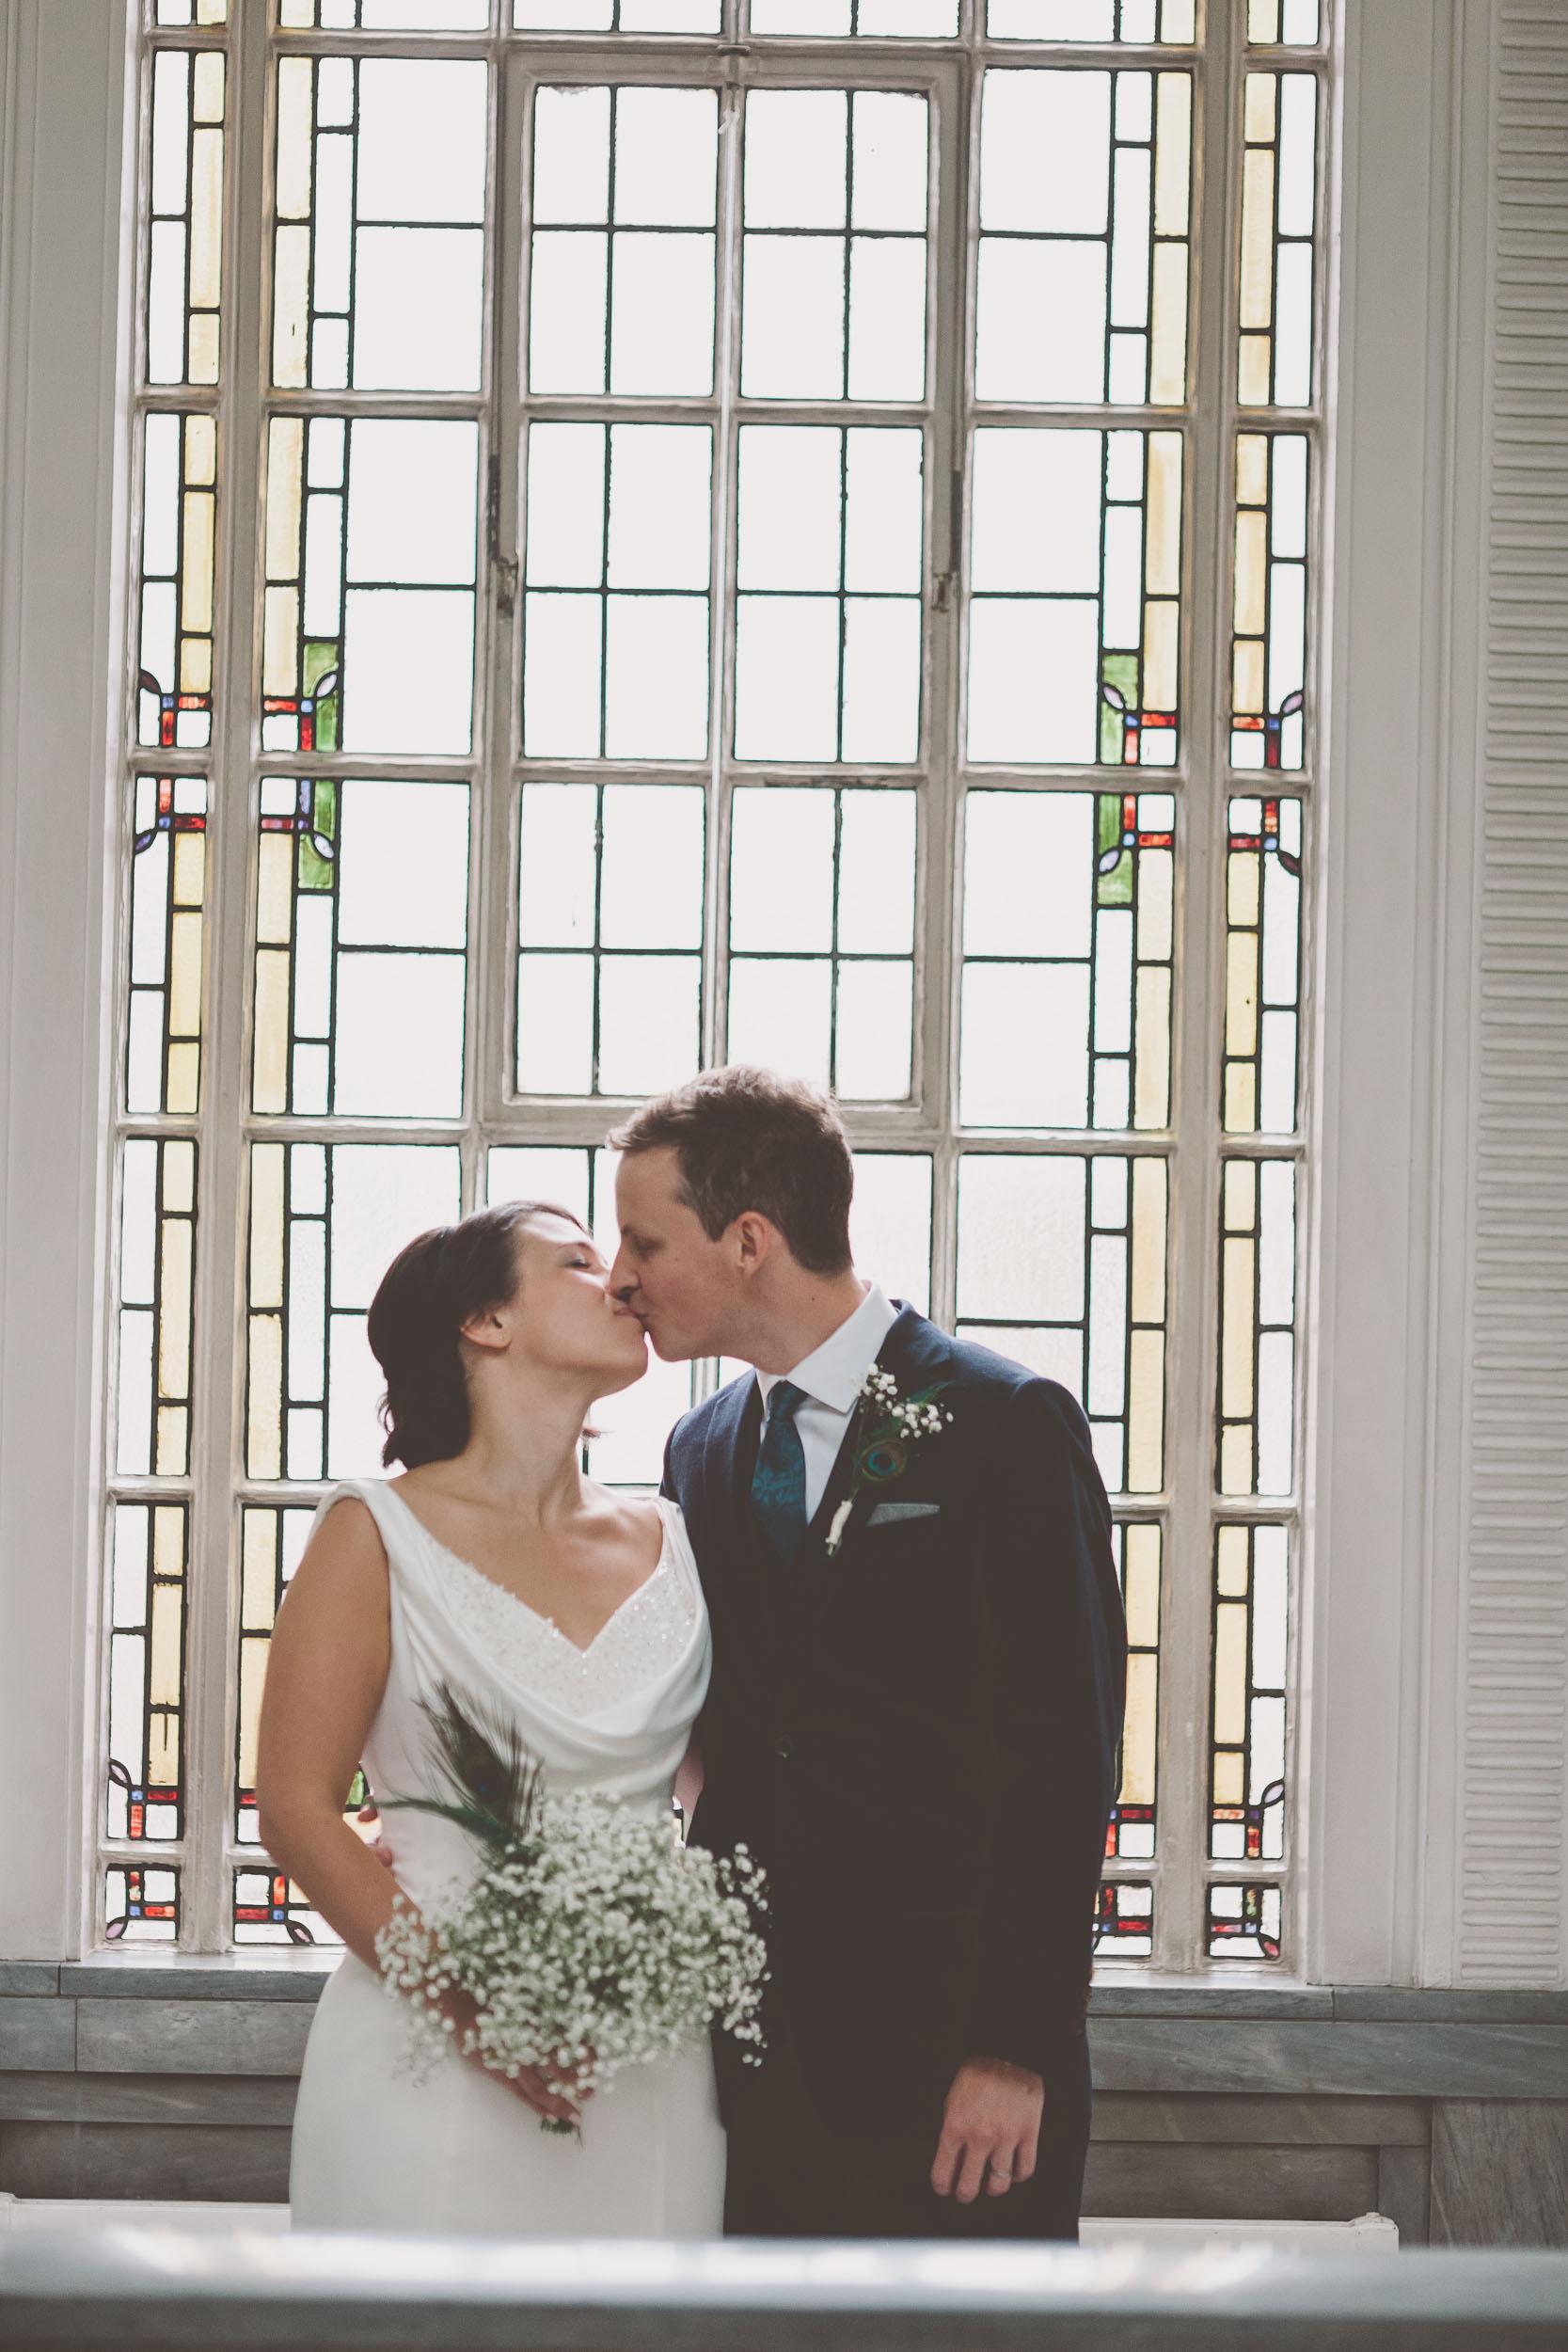 islington-town-hall-4th-floor-studios-wedding138.jpg